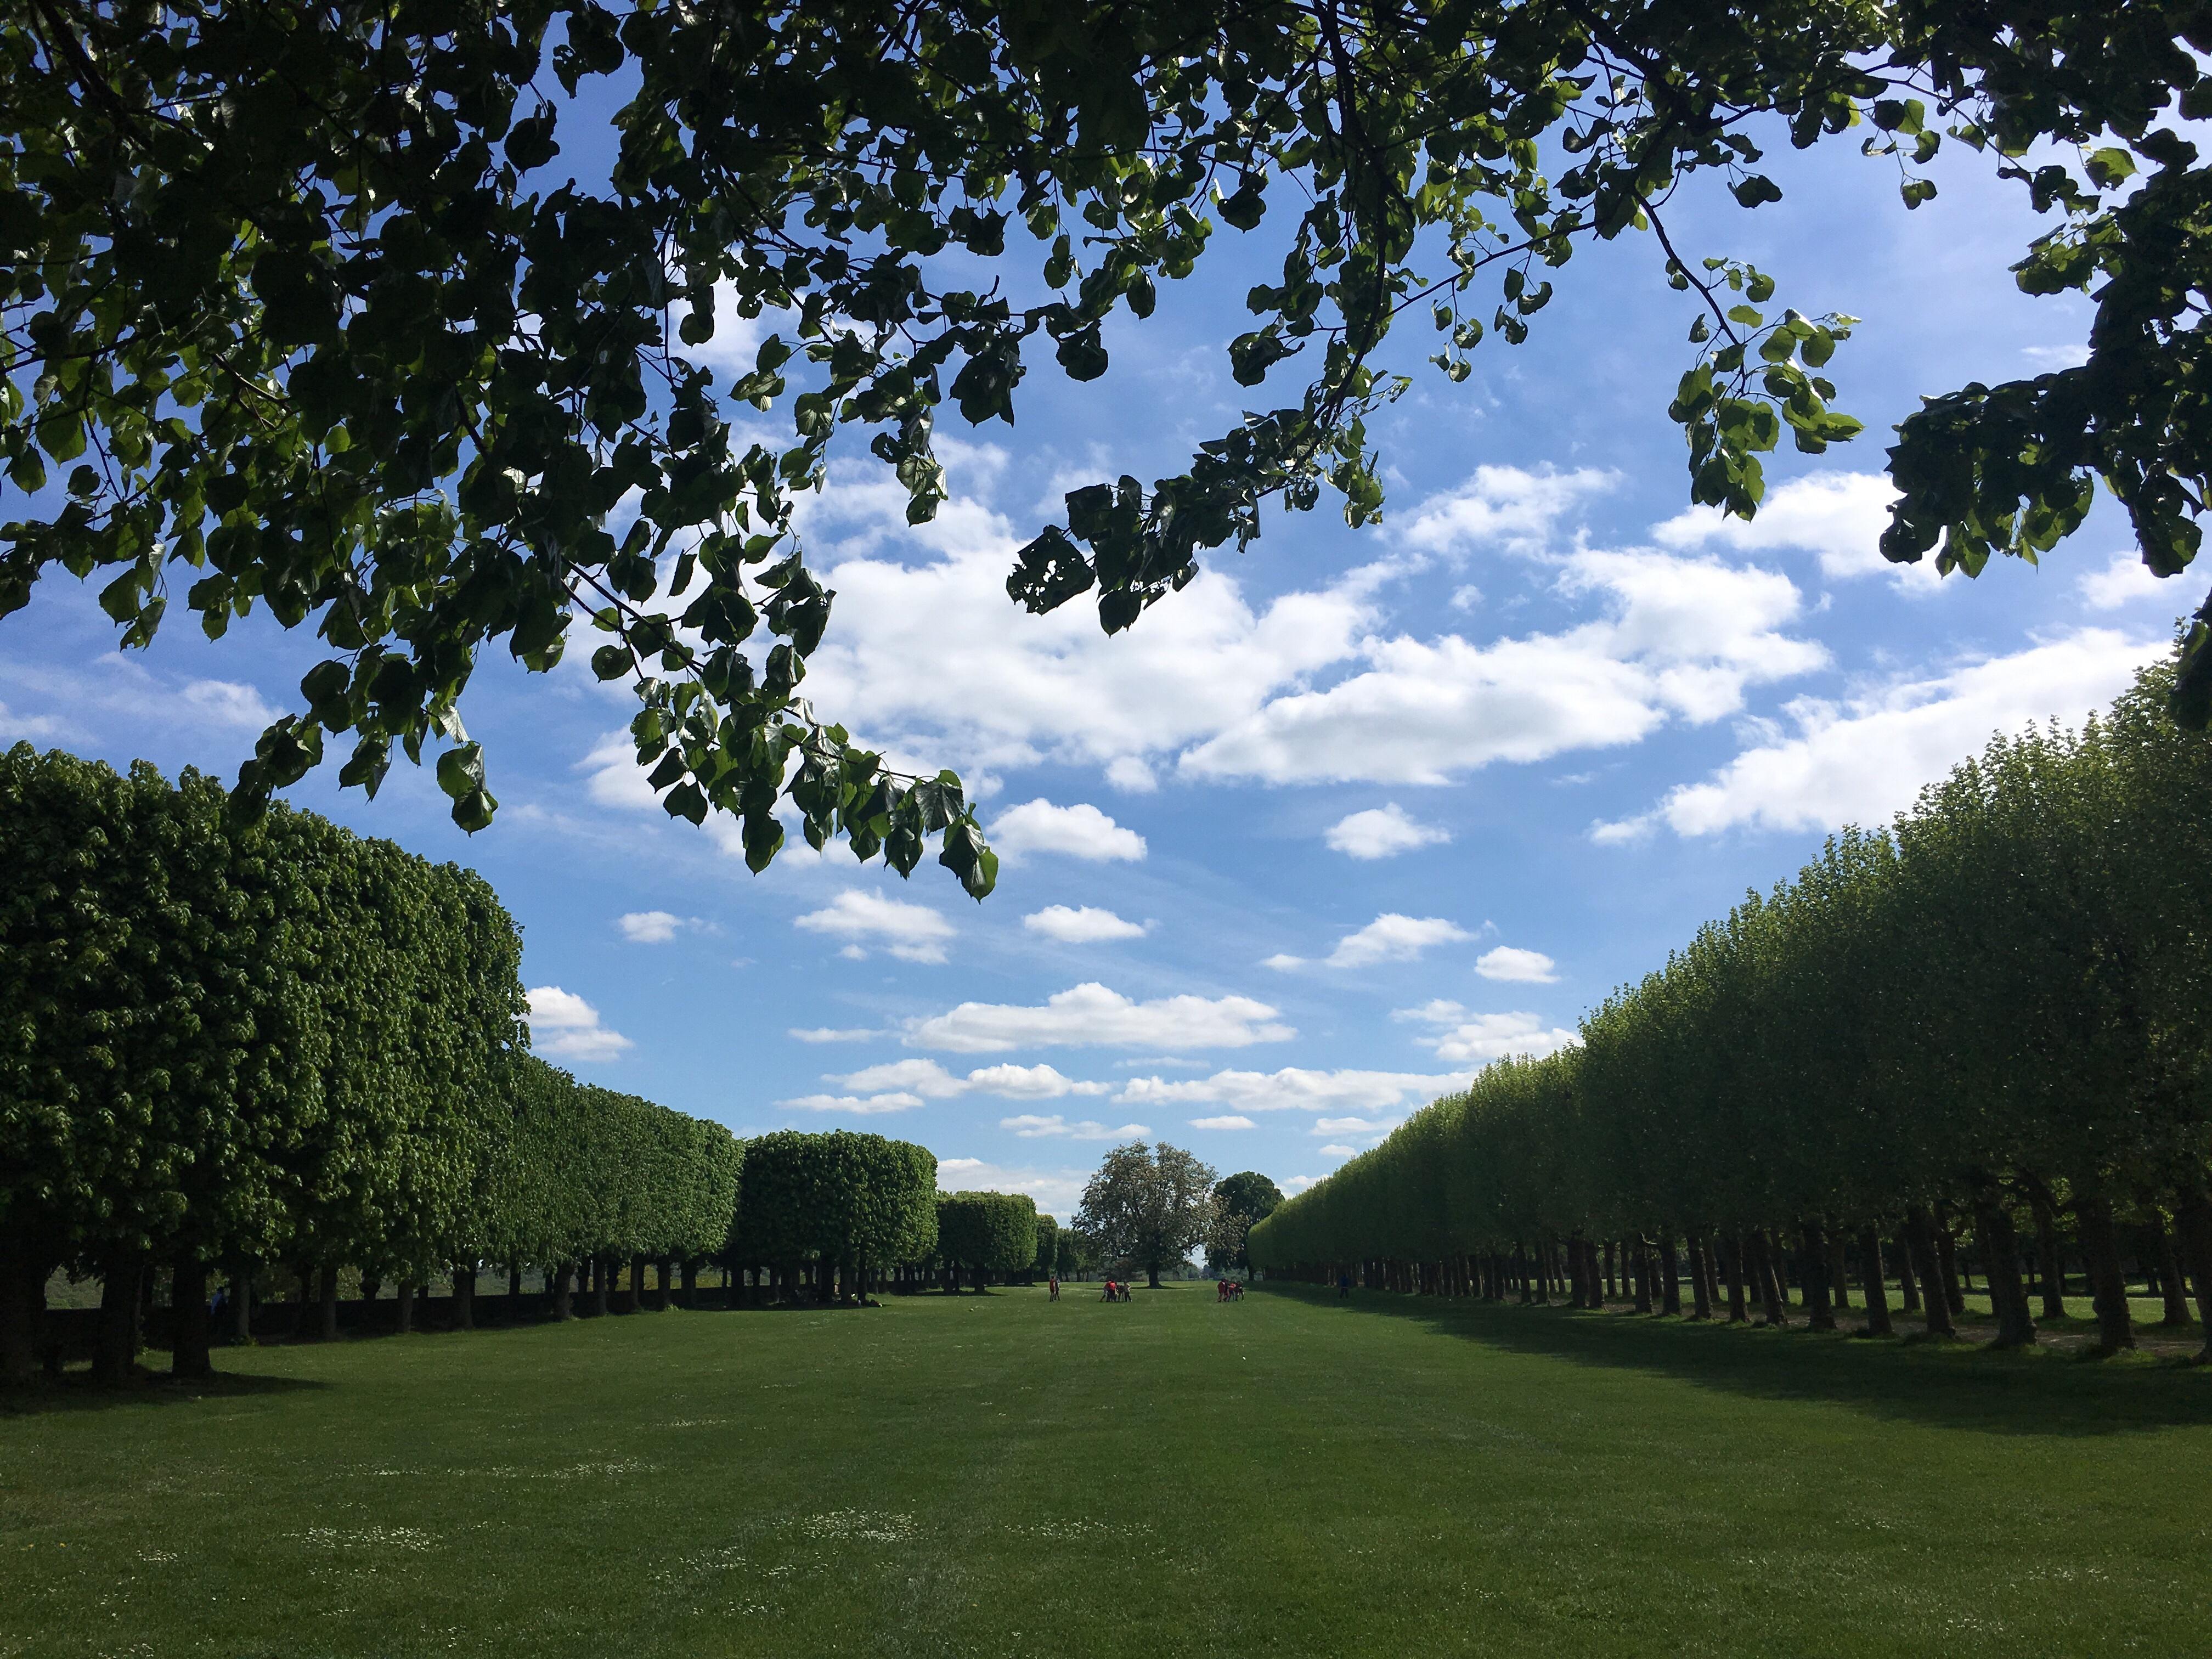 Meudon Park clouds trees blue skies